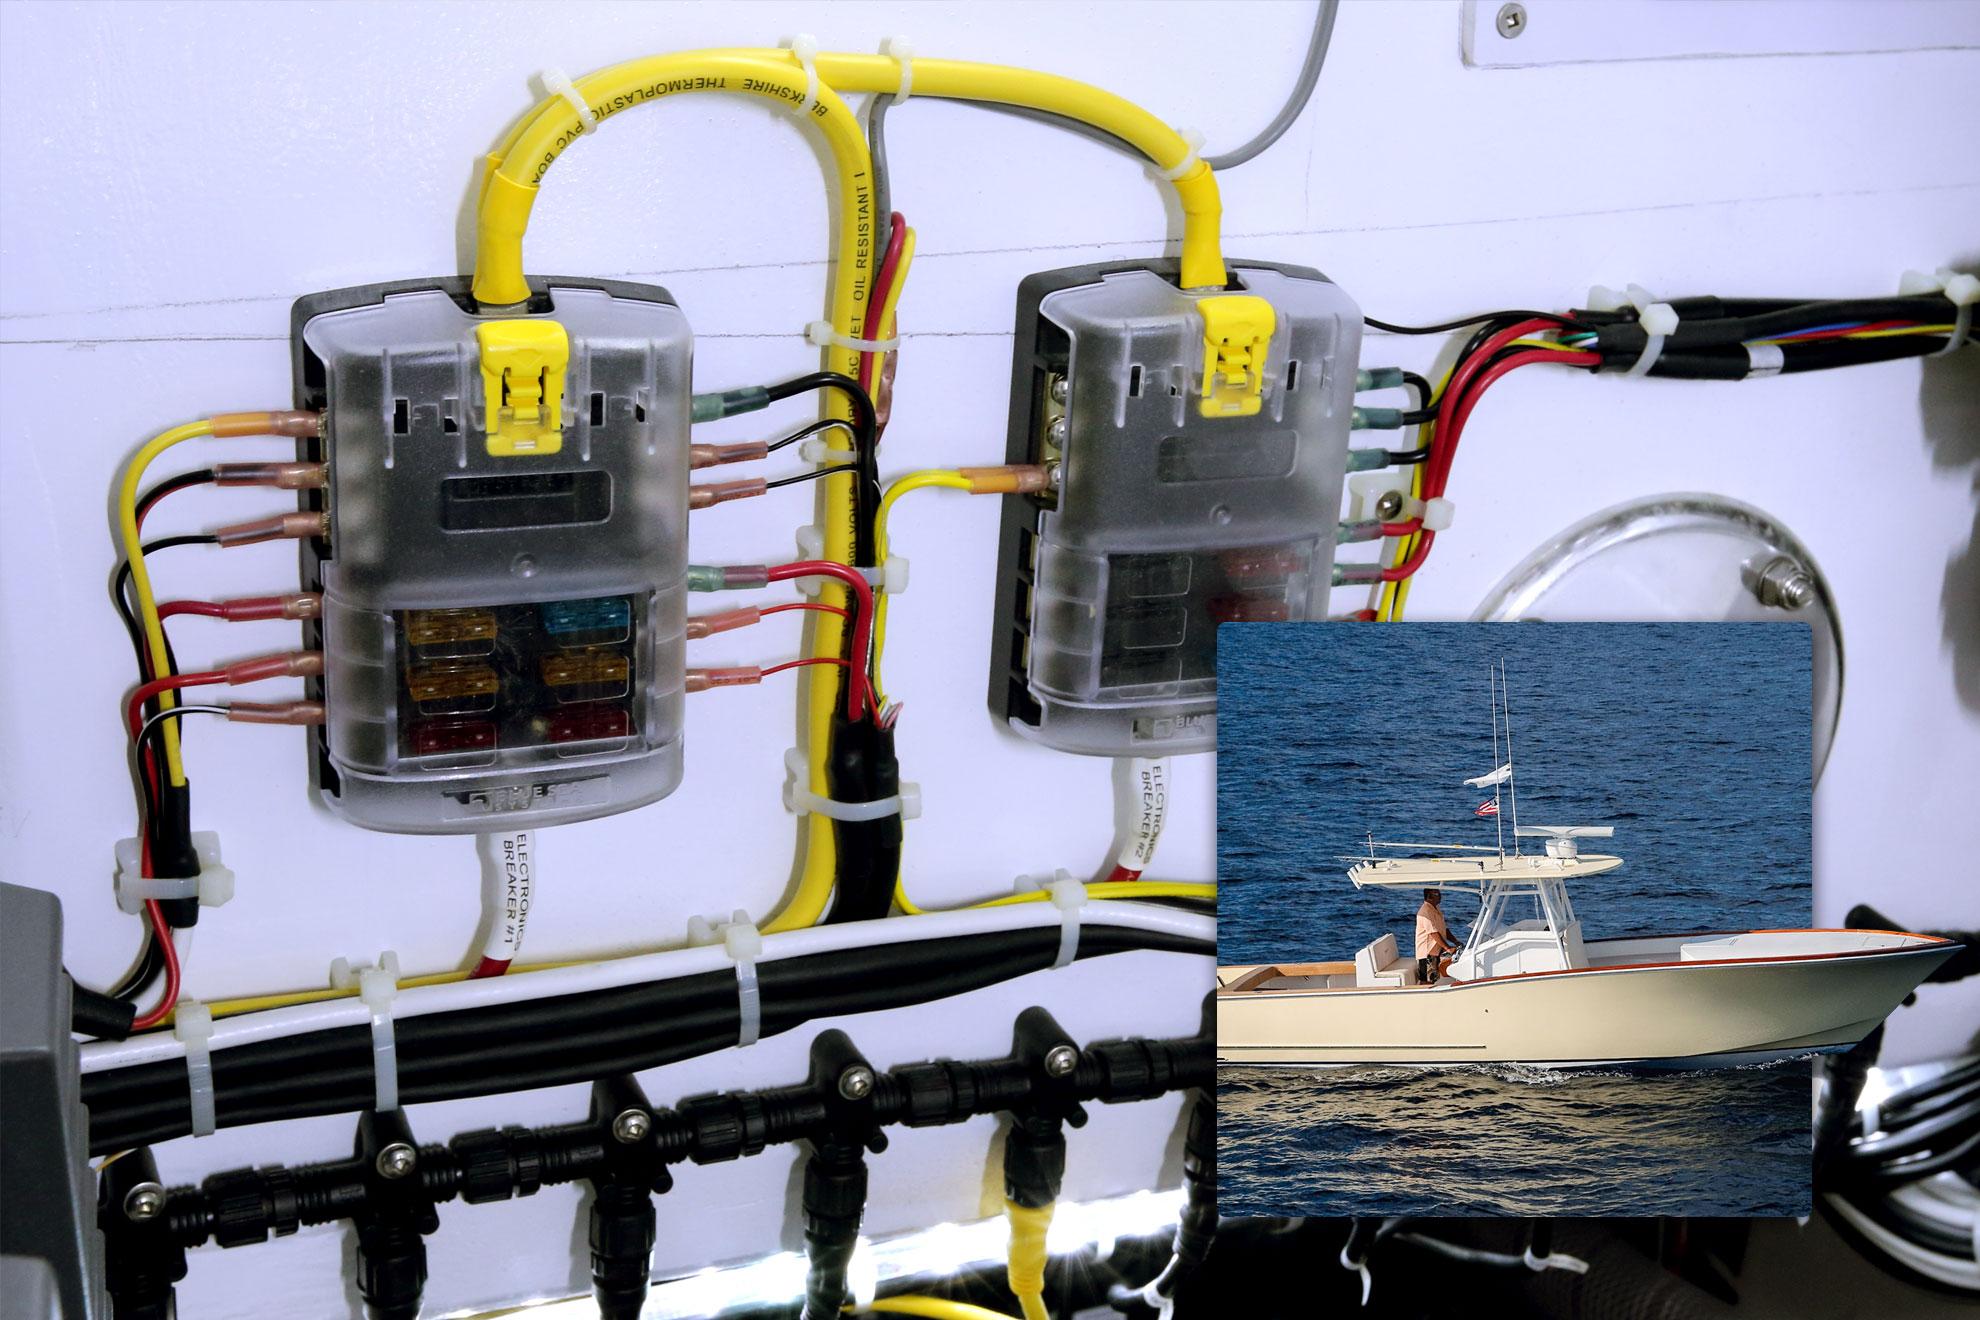 blue sea 5026 wiring diagram big tex trailer wire 10sr 12lx bonadeo boatworks uses systems 5025 st blade fuse